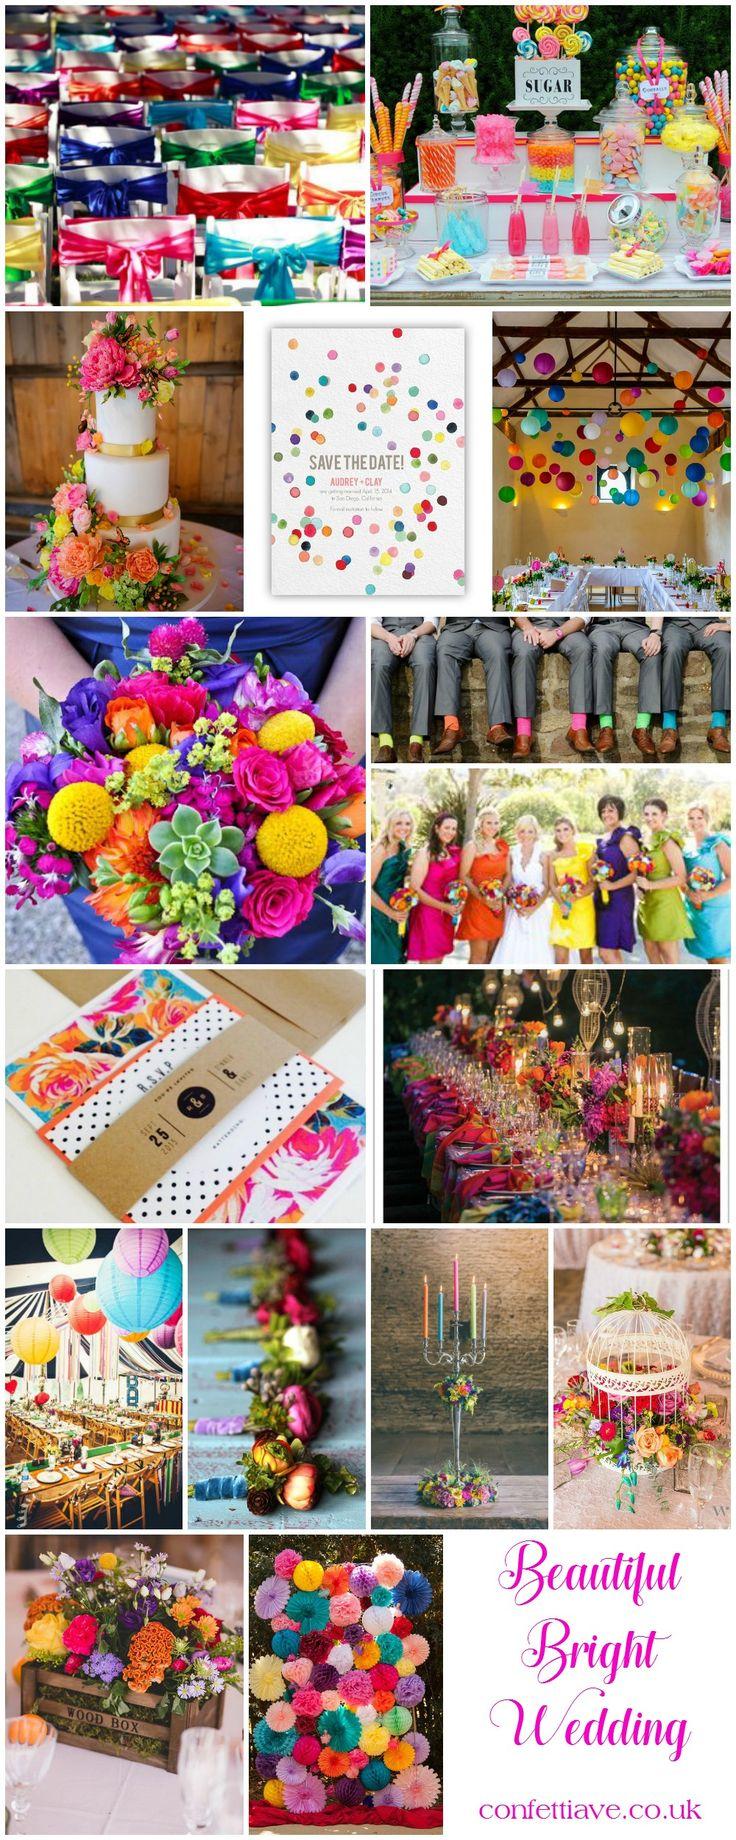 Beautiful Bright Wedding | Mood Board http://confettiave.co.uk/beautiful-bright-wedding